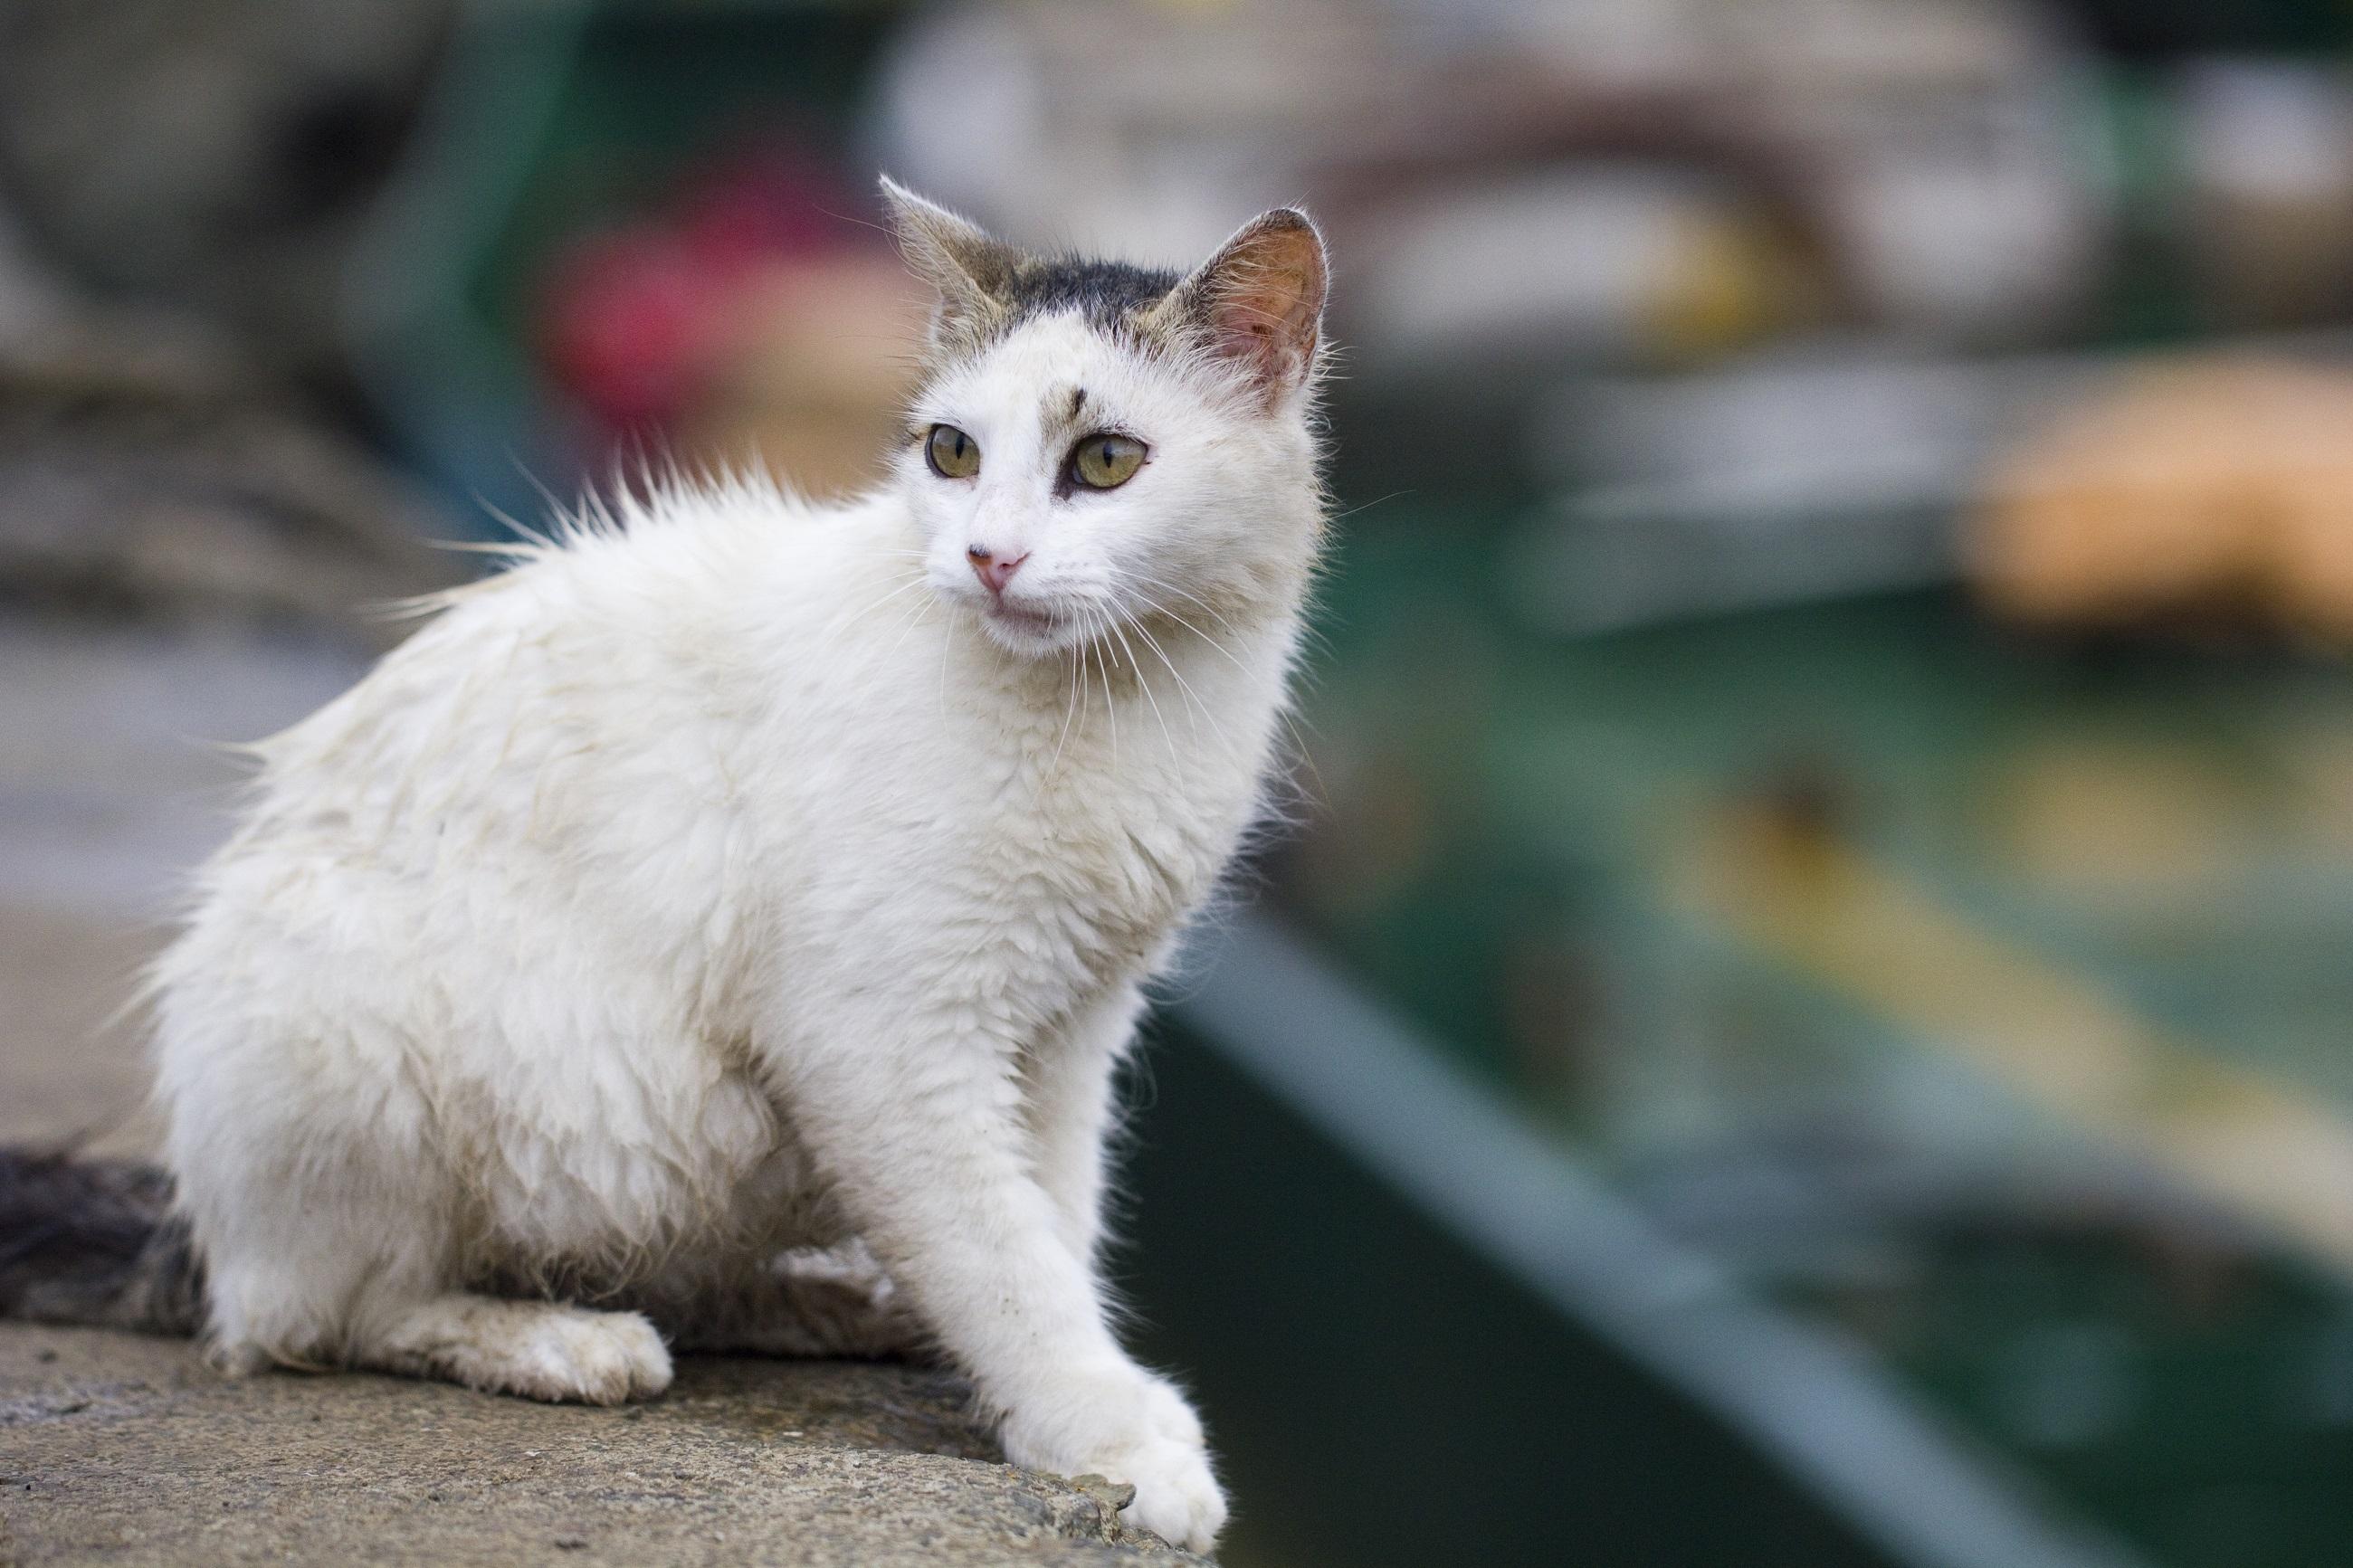 White Cat, Animal, Cat, Friend, Loyal, HQ Photo